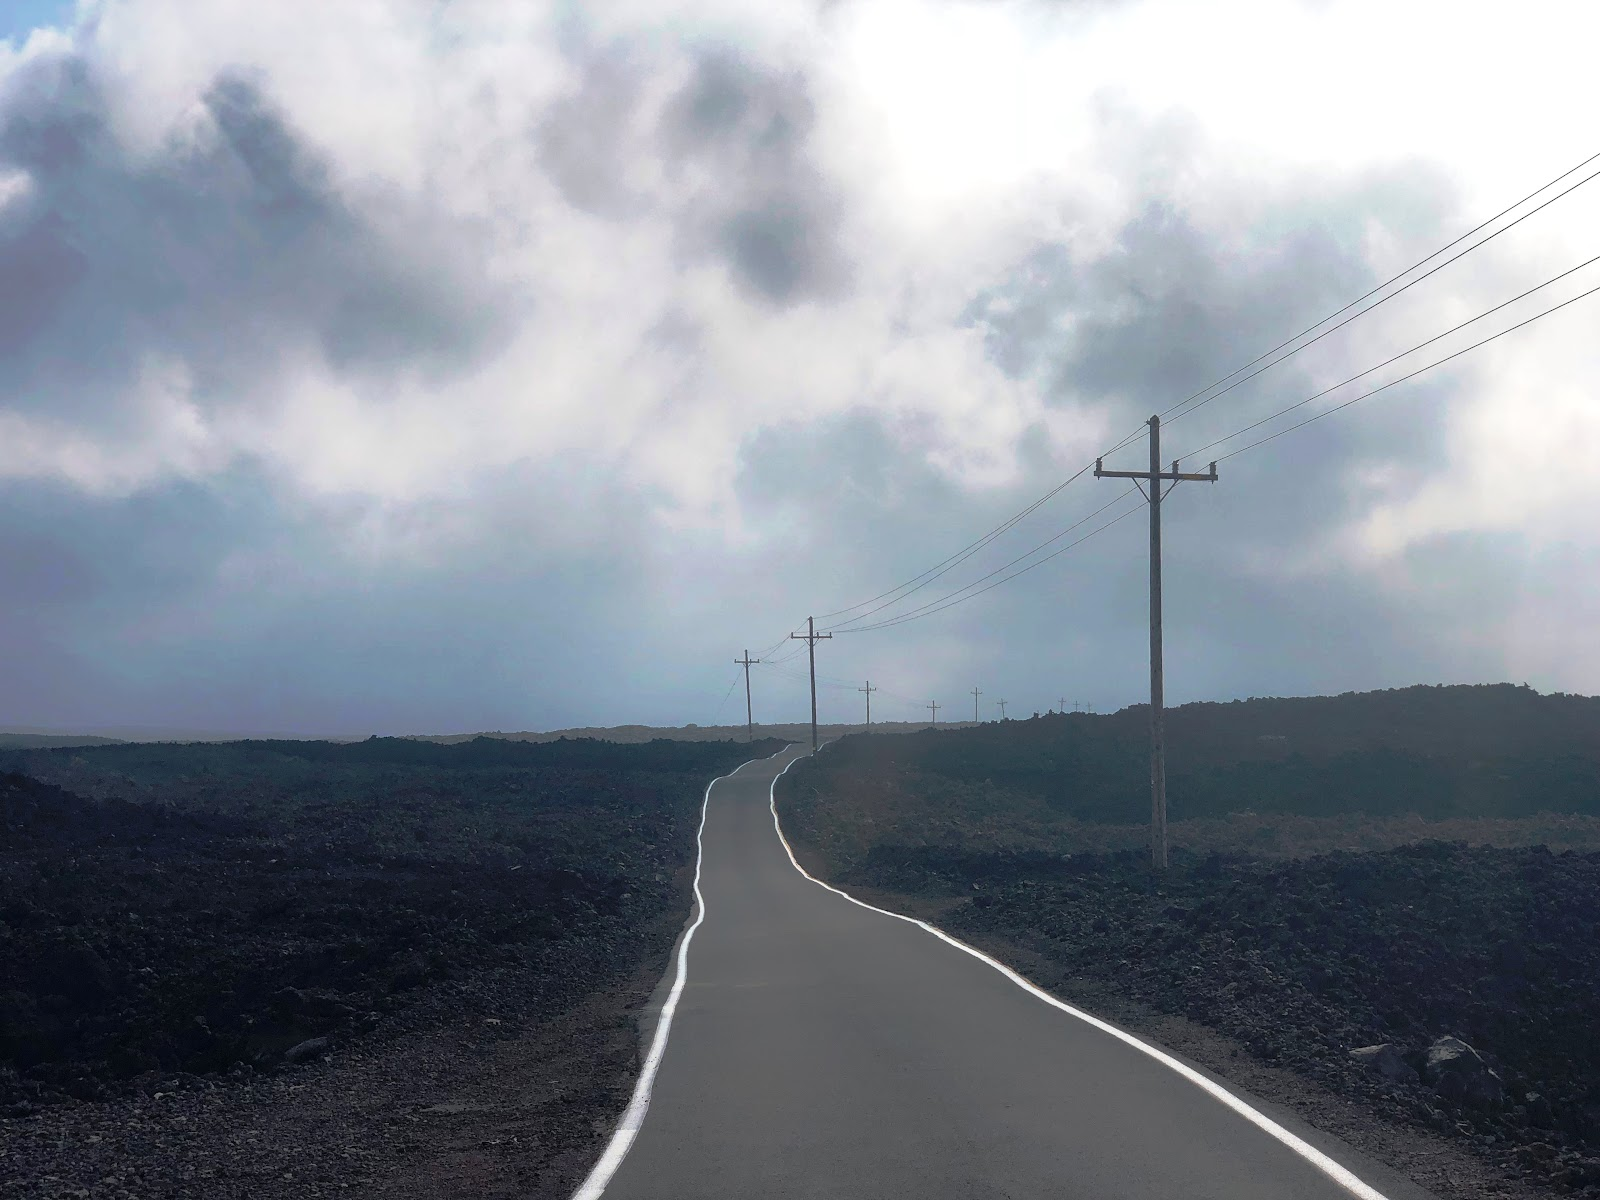 Climbing Mauna Loa by bike - Mauna Loa Observatory Road - roadway and telephone poles with lava field